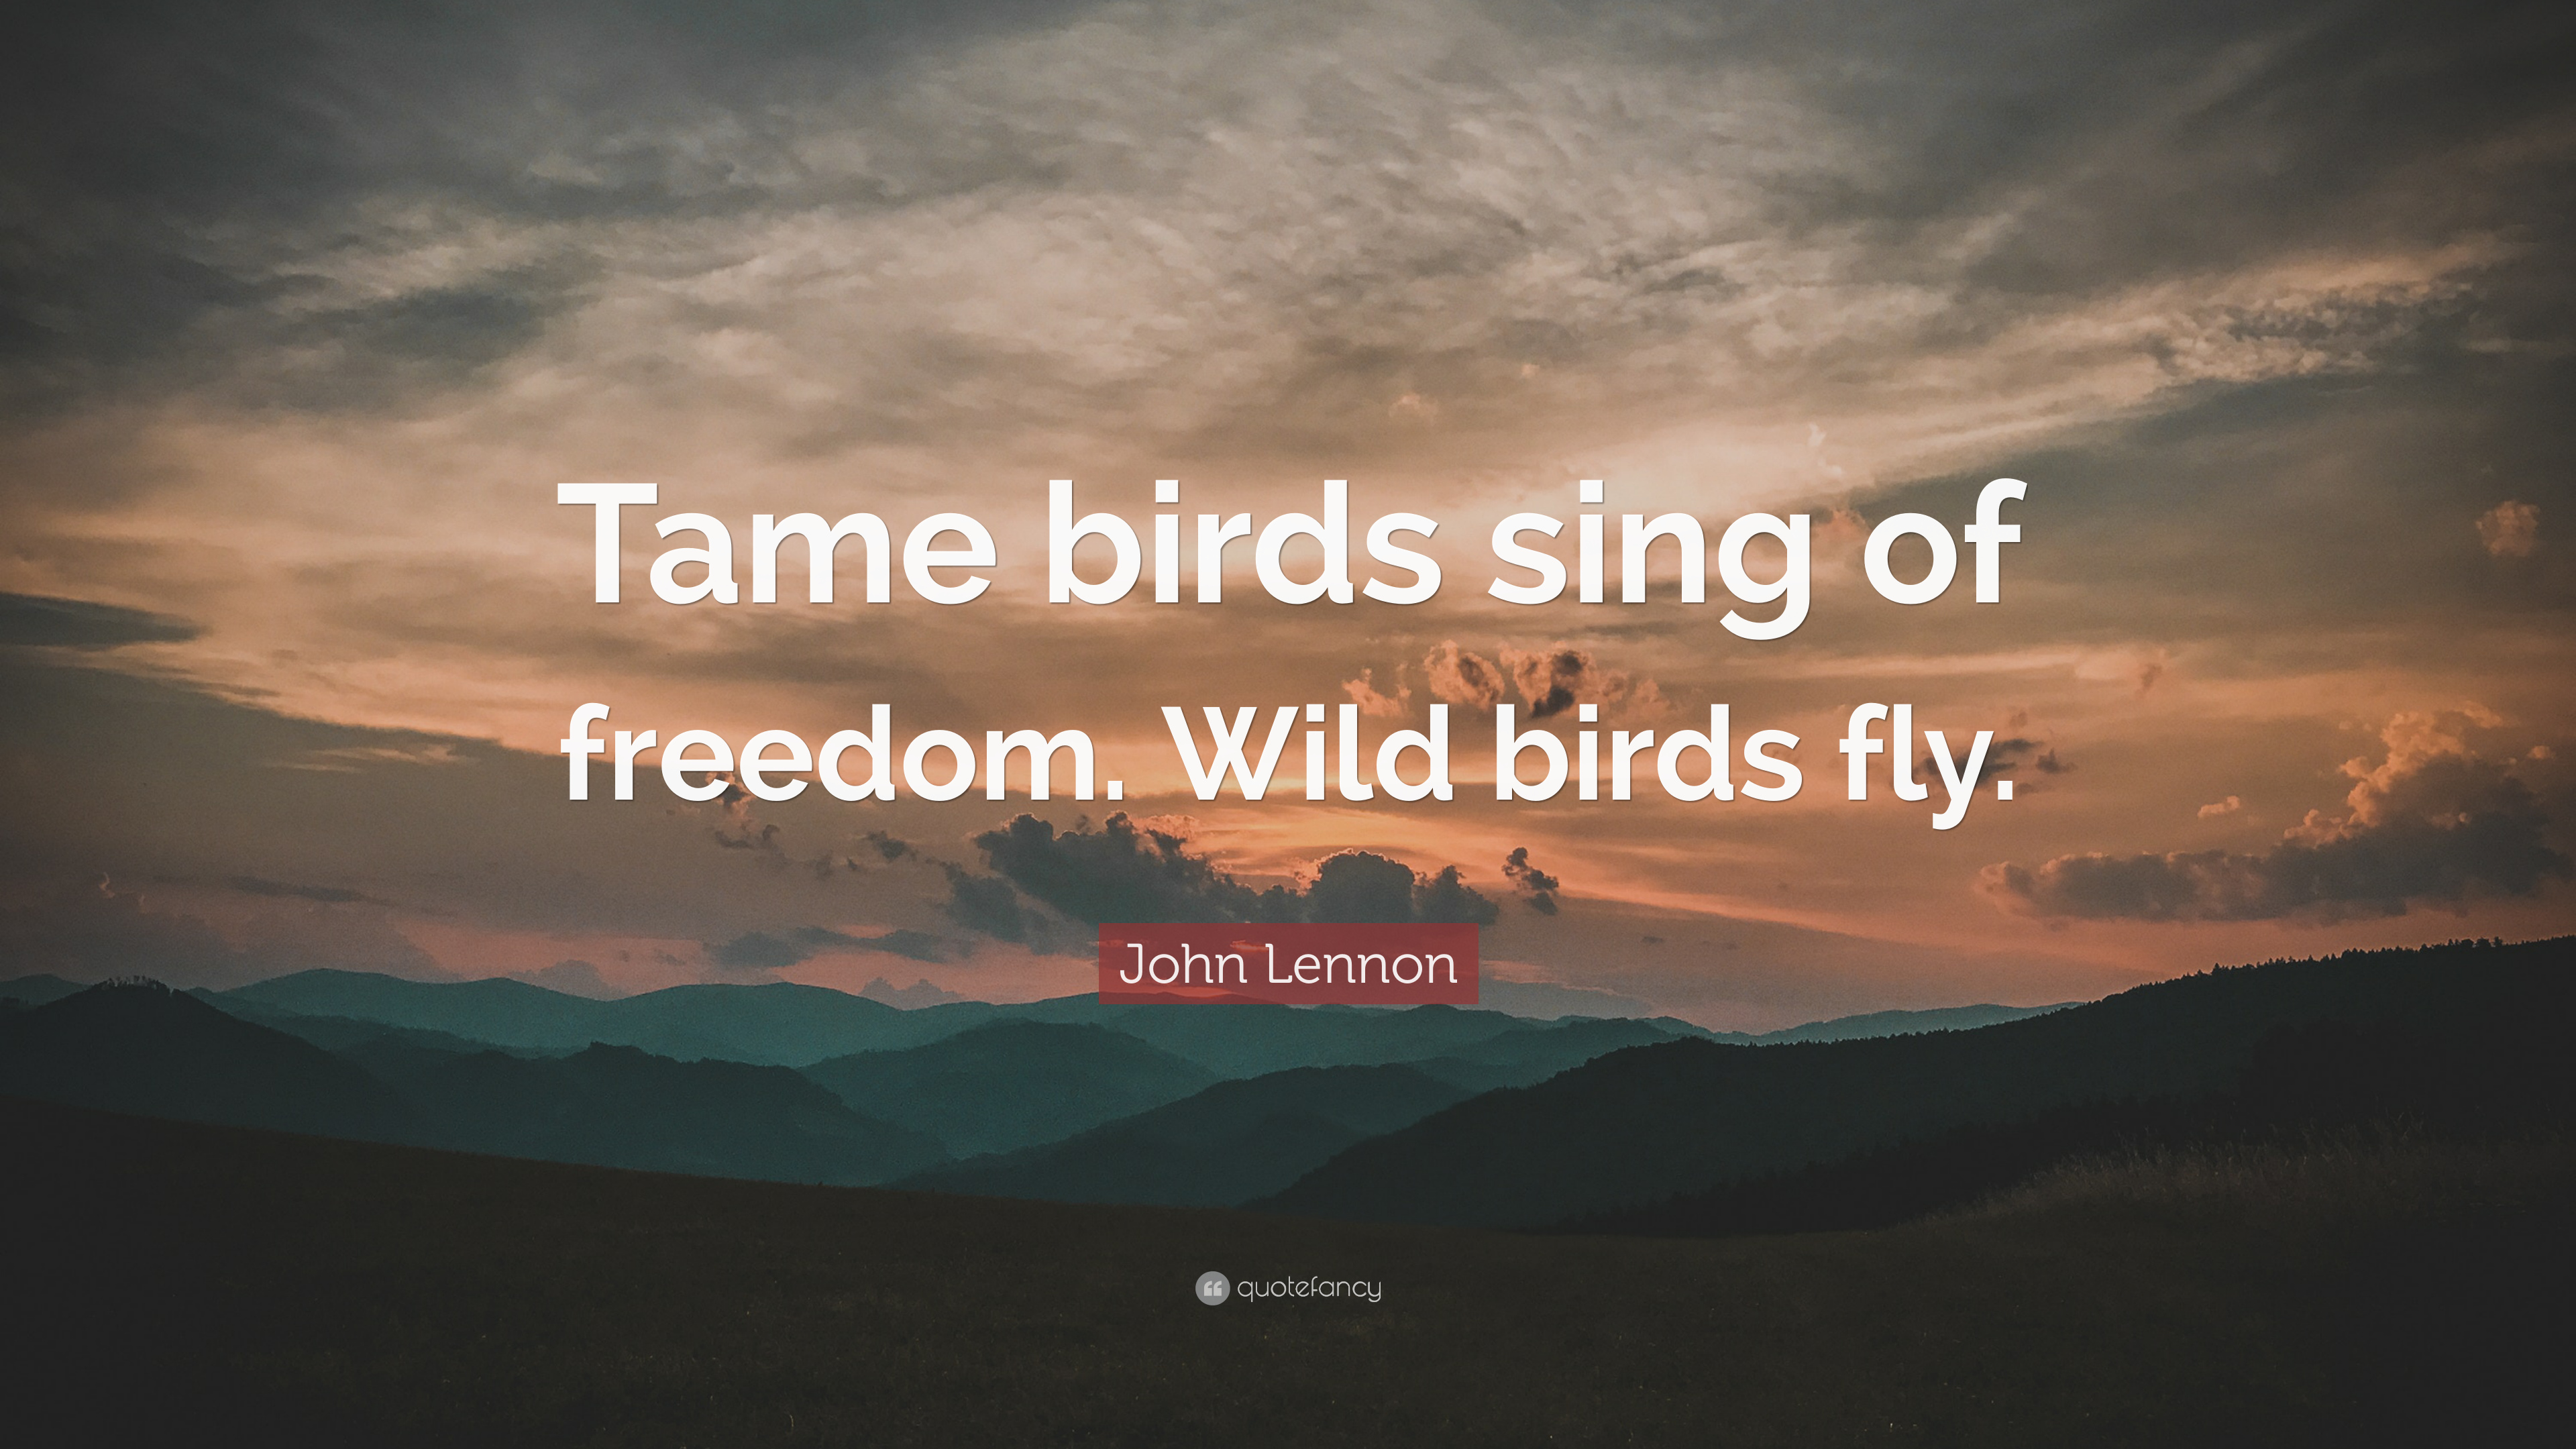 John Lennon Quote Tame Birds Sing Of Freedom Wild Birds Fly 12